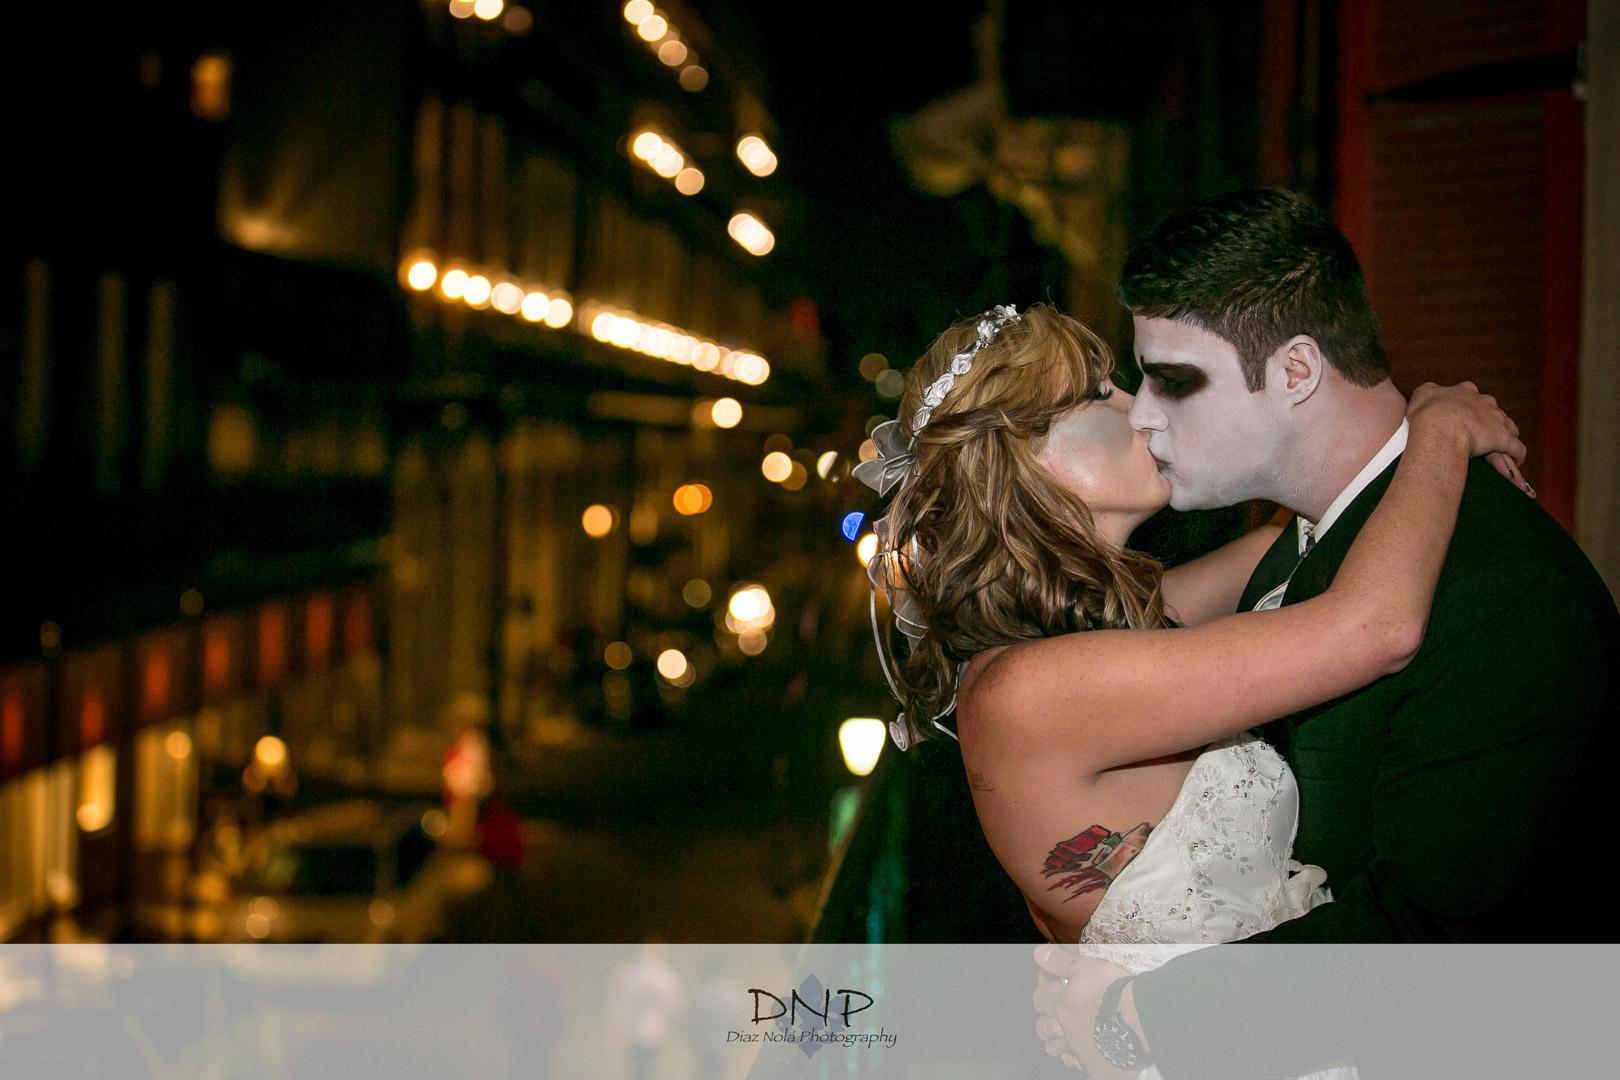 Daysha & Jonas-Corpse Bride & Groom (19 of 35)